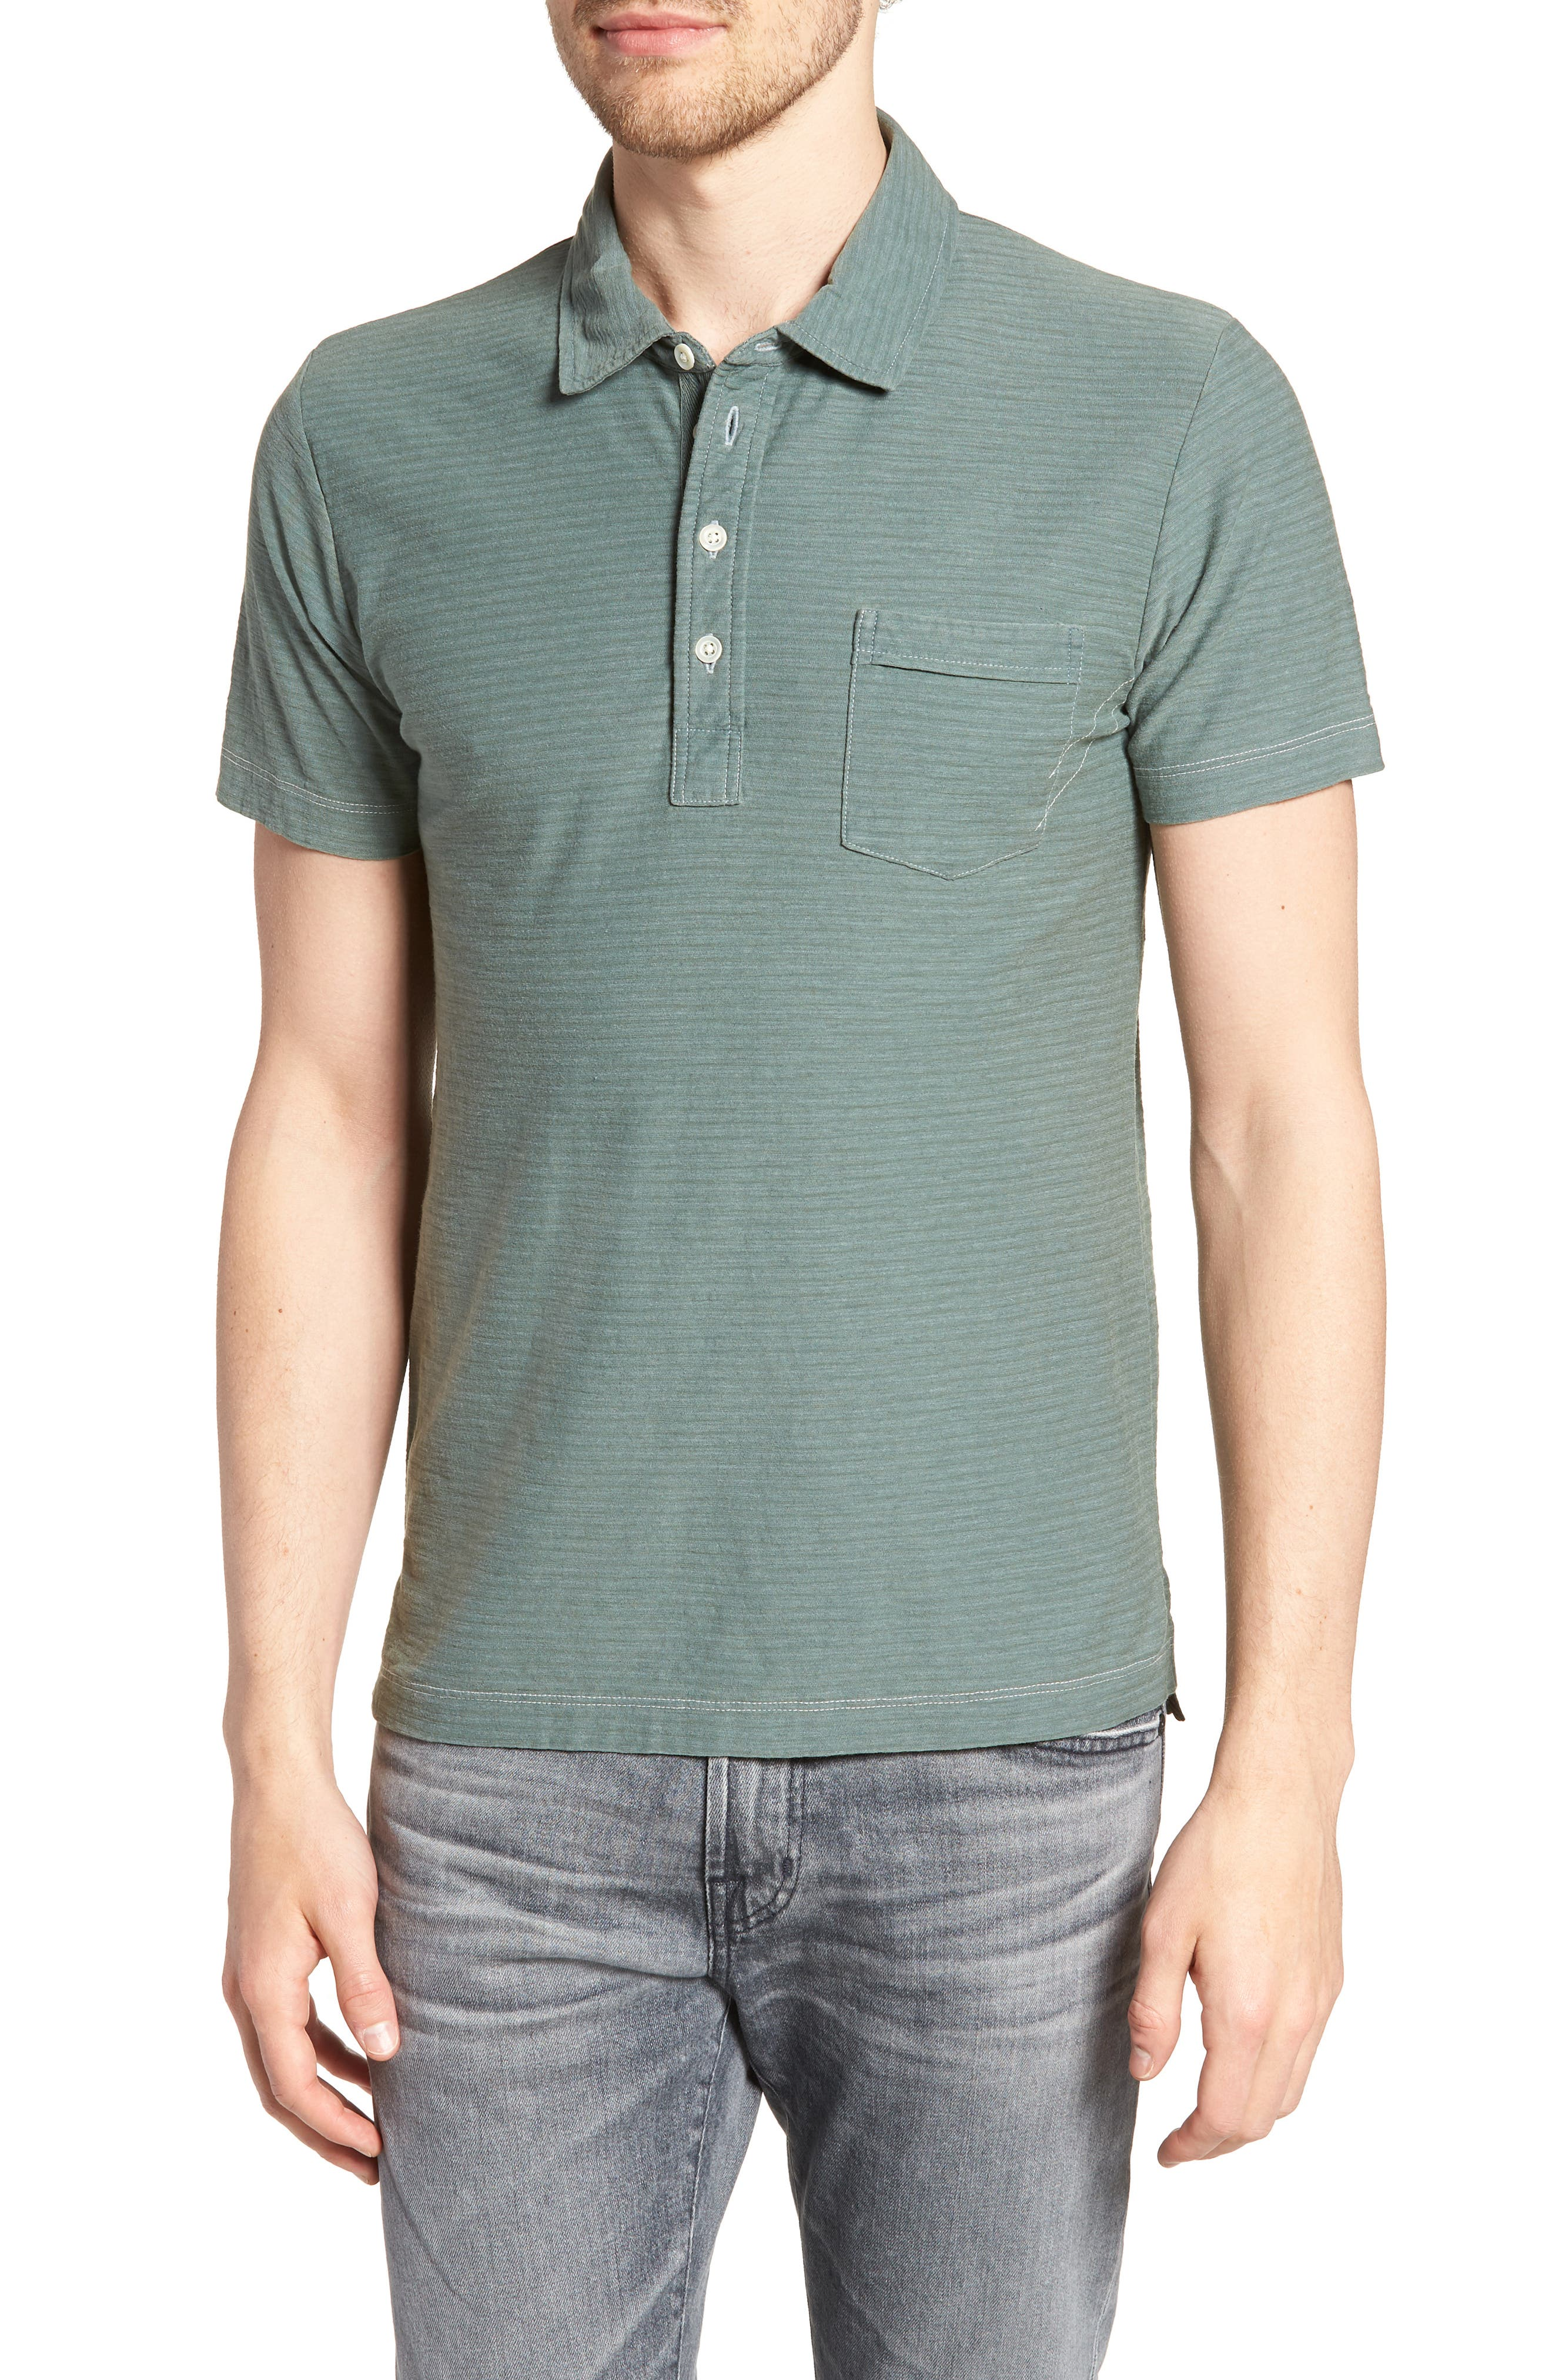 Pensacola Cotton Blend Polo Shirt,                             Main thumbnail 1, color,                             SAGE